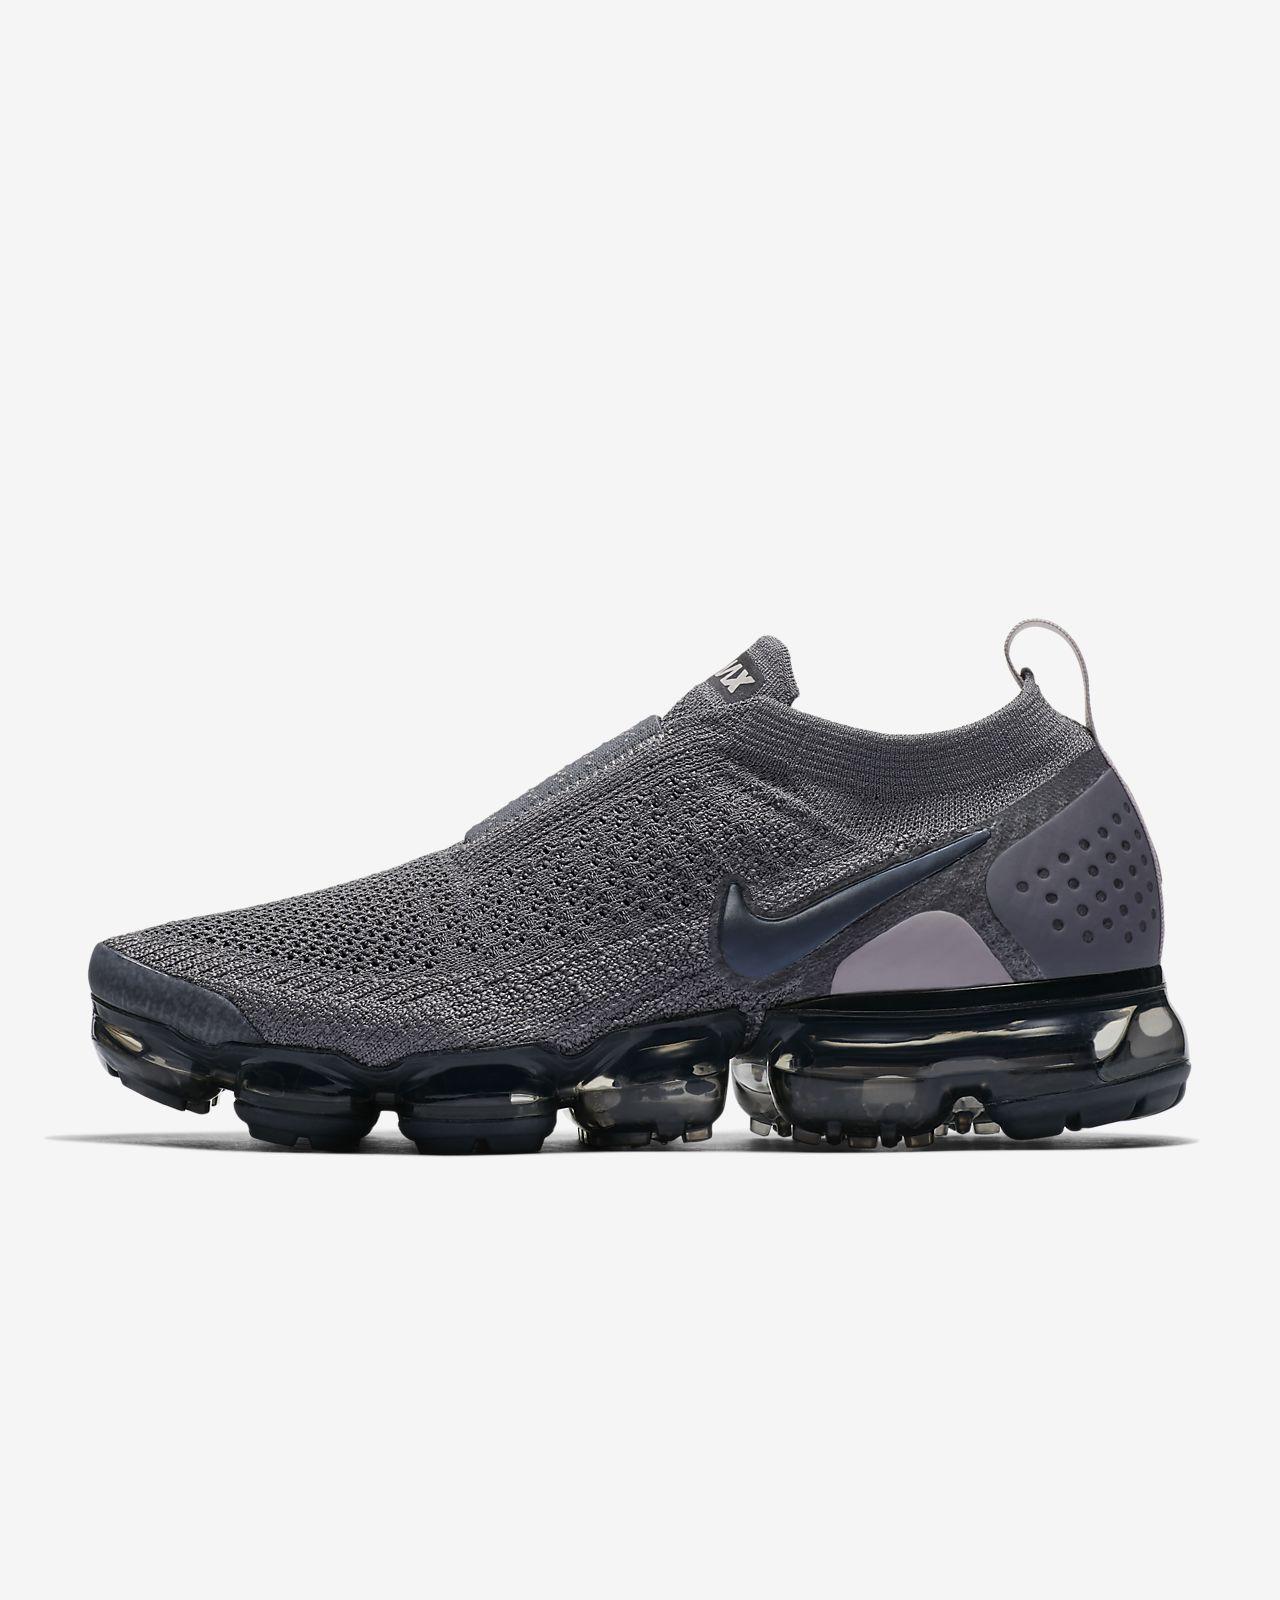 Chaussure Nike Air VaporMax Flyknit Moc 2 pour Femme